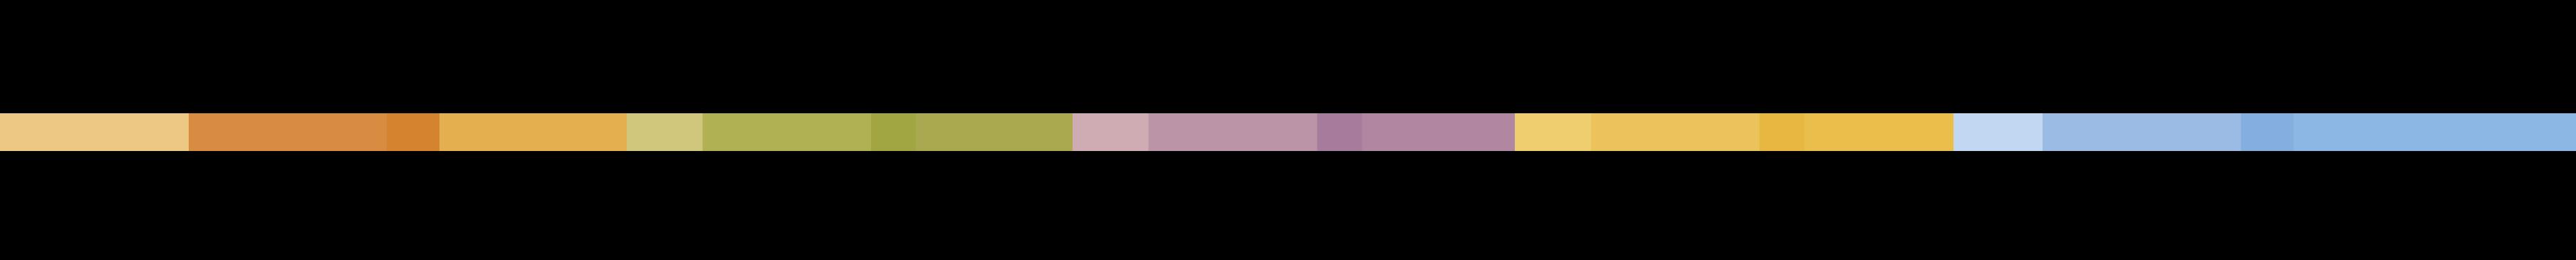 barra de colores